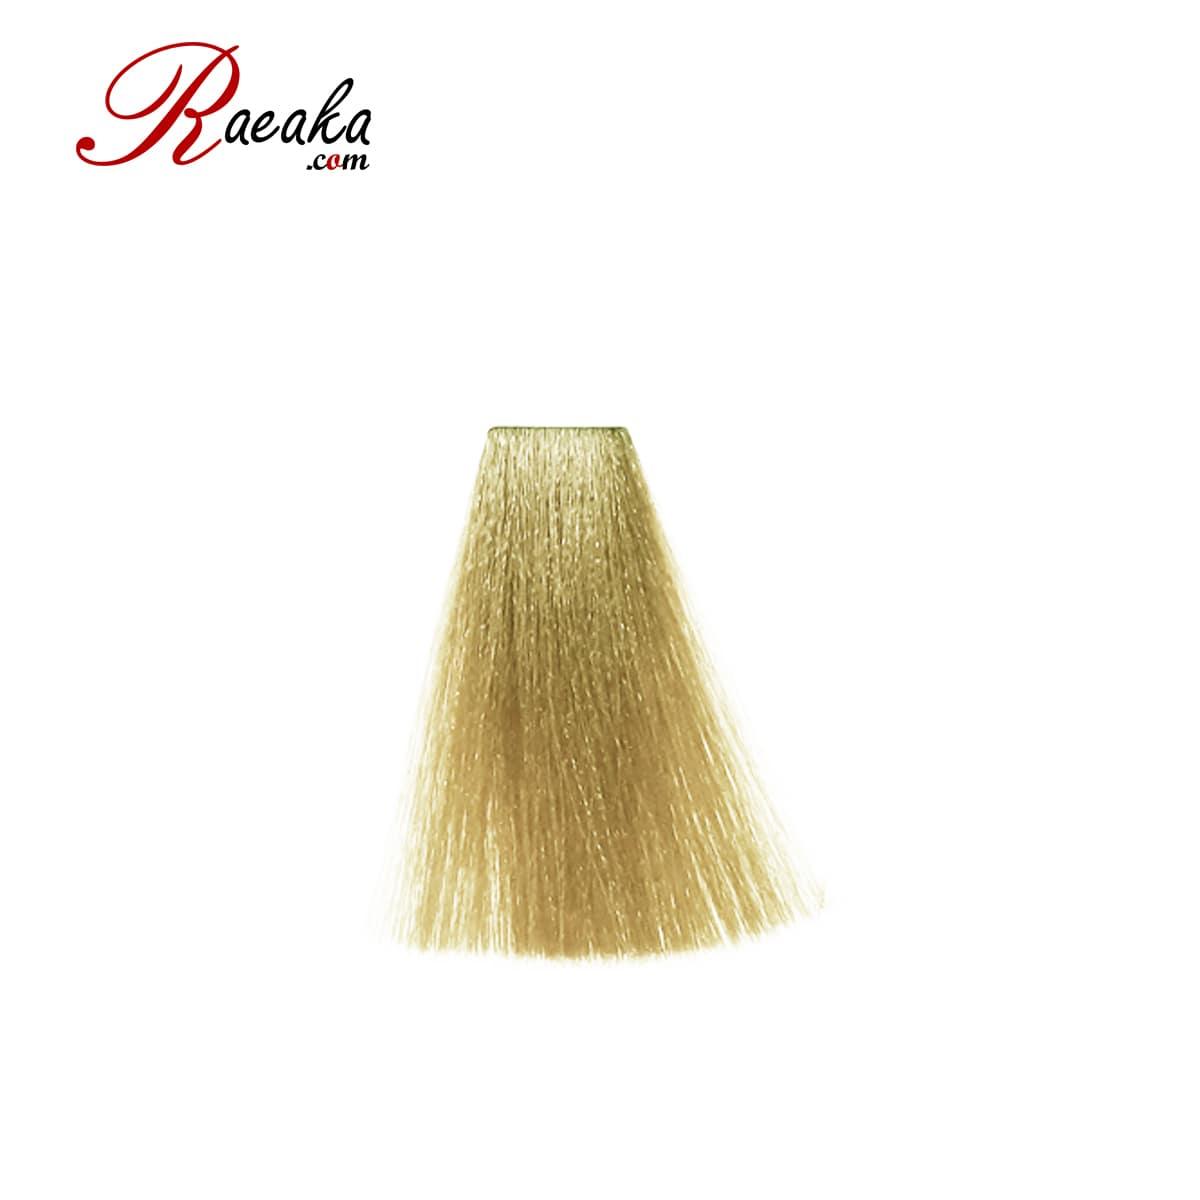 رنگ مو دوماسی سری بژ بلوند بژپلاتینه ۱۰٫۳۱ حجم ۱۲۰ میلی لیتر